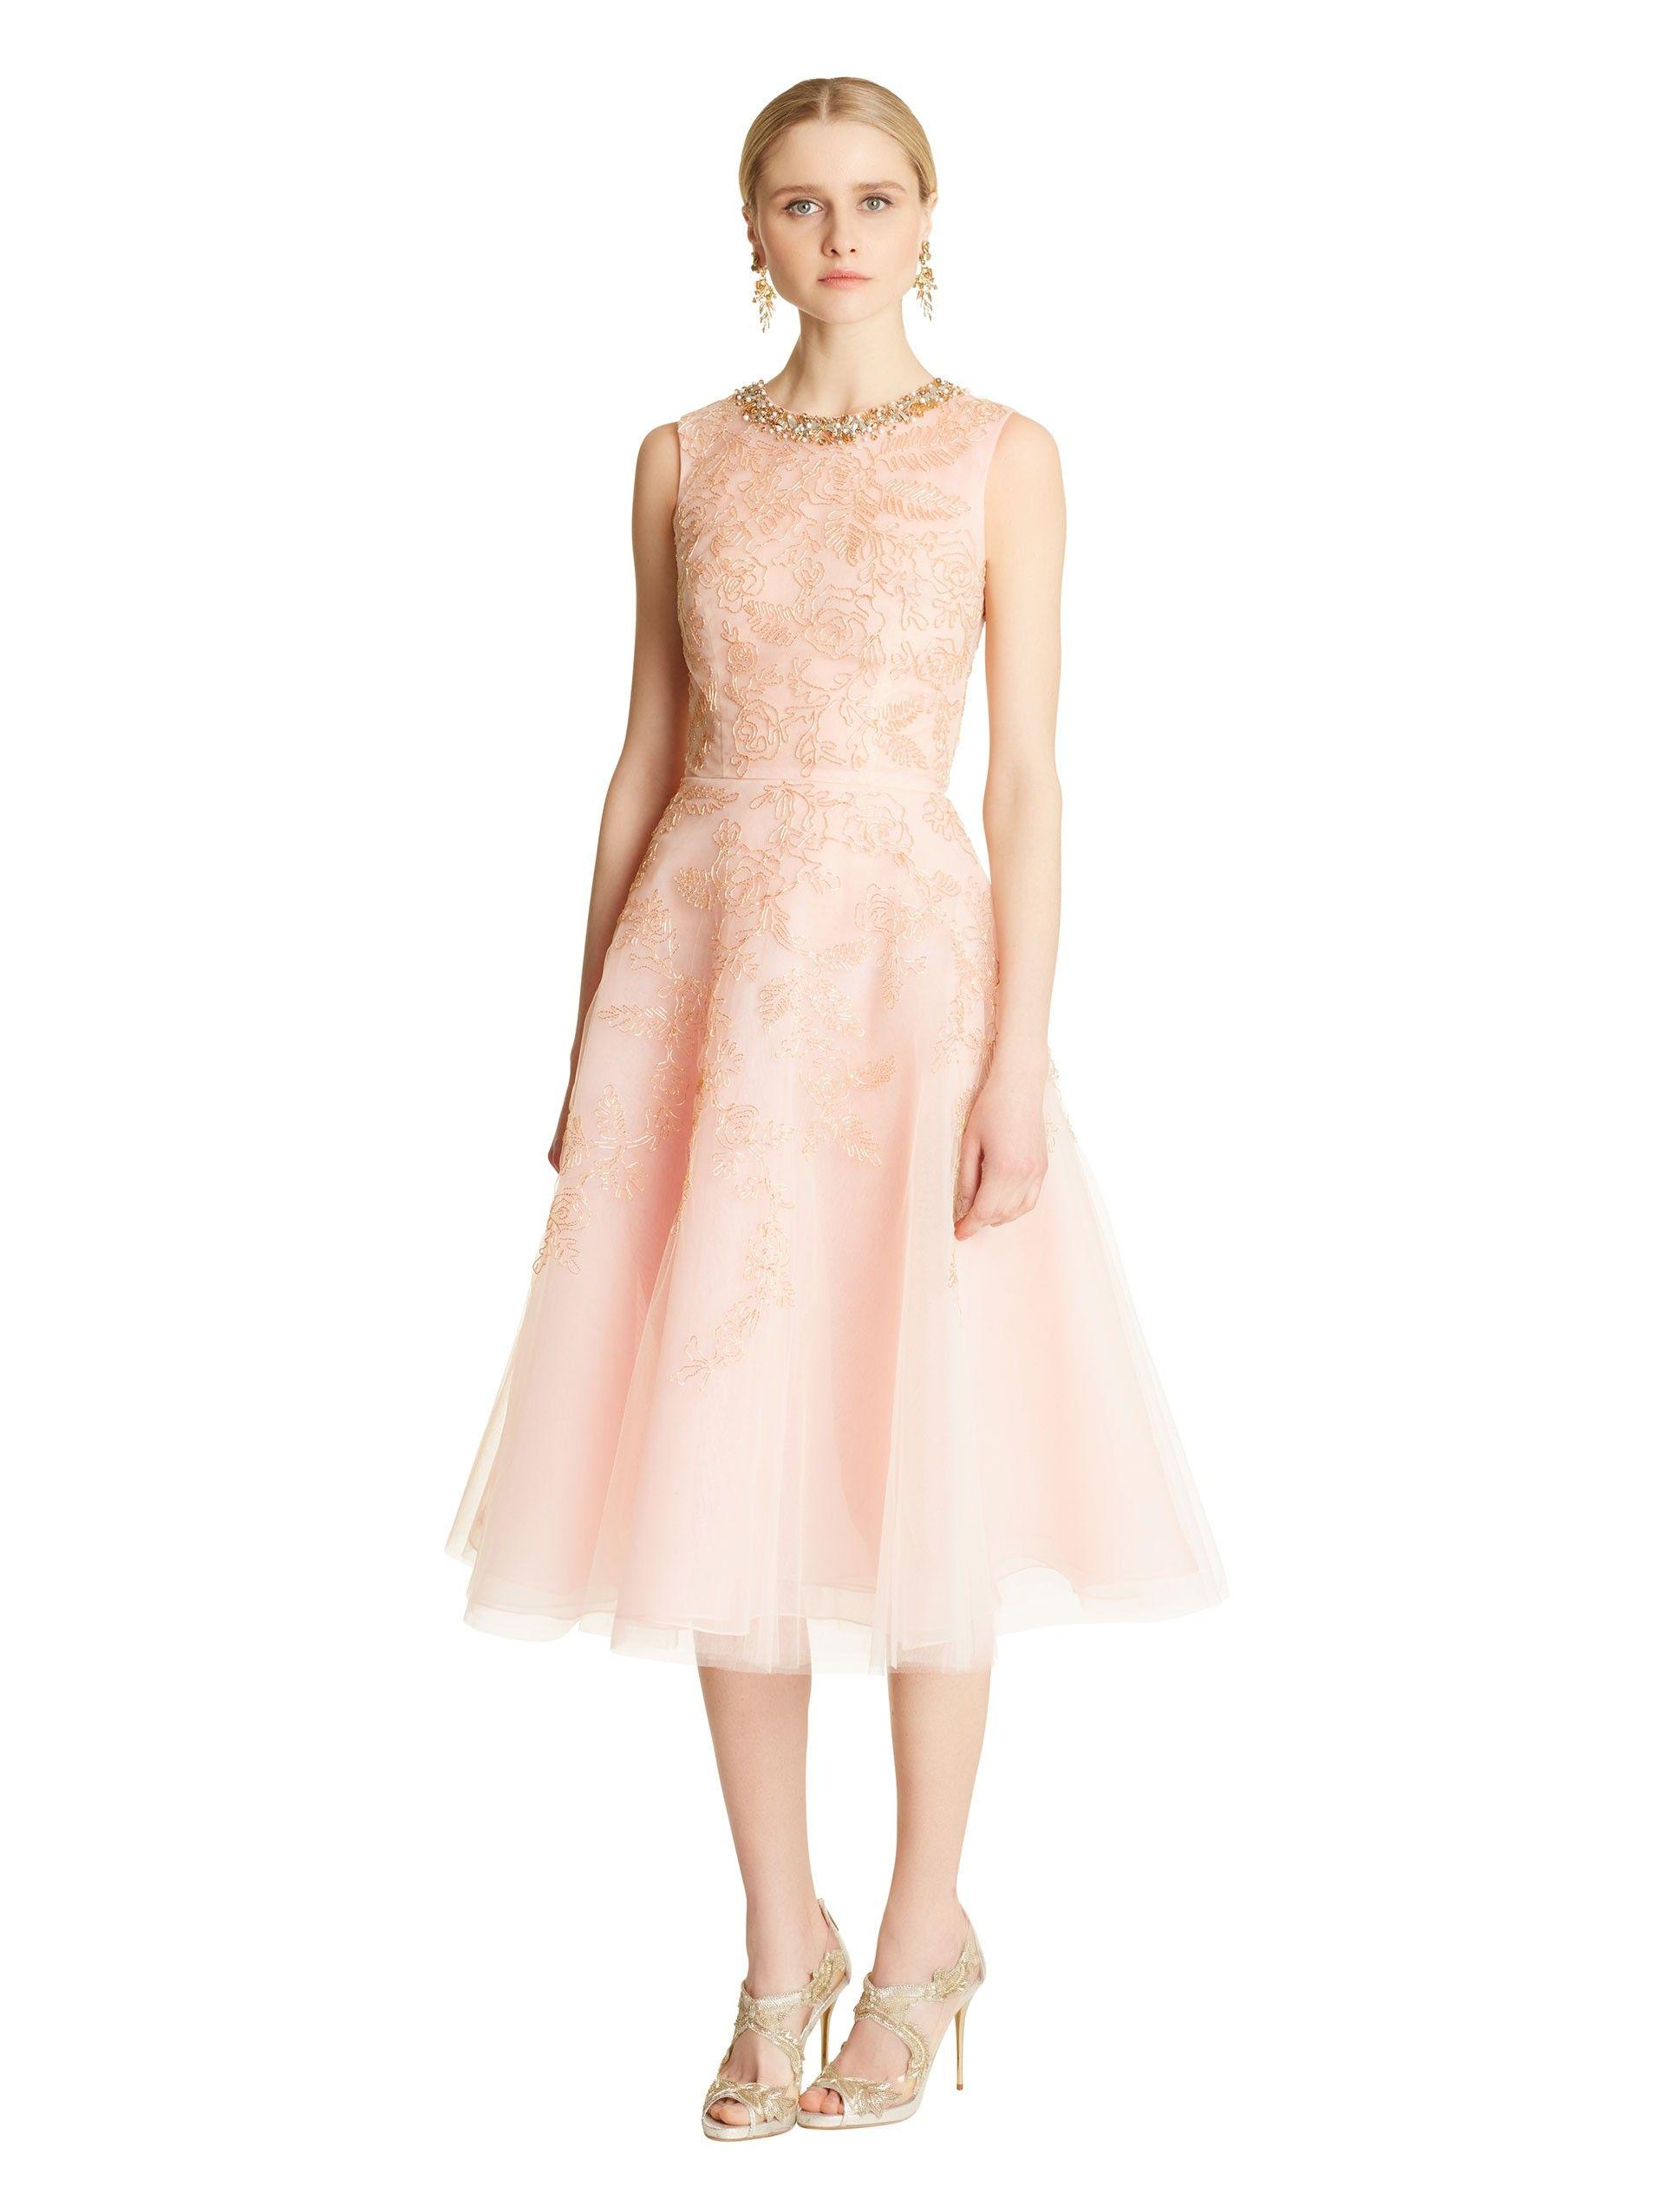 Oscar de la Renta - Lamé Floral Cord Embroidered Tulle Dress